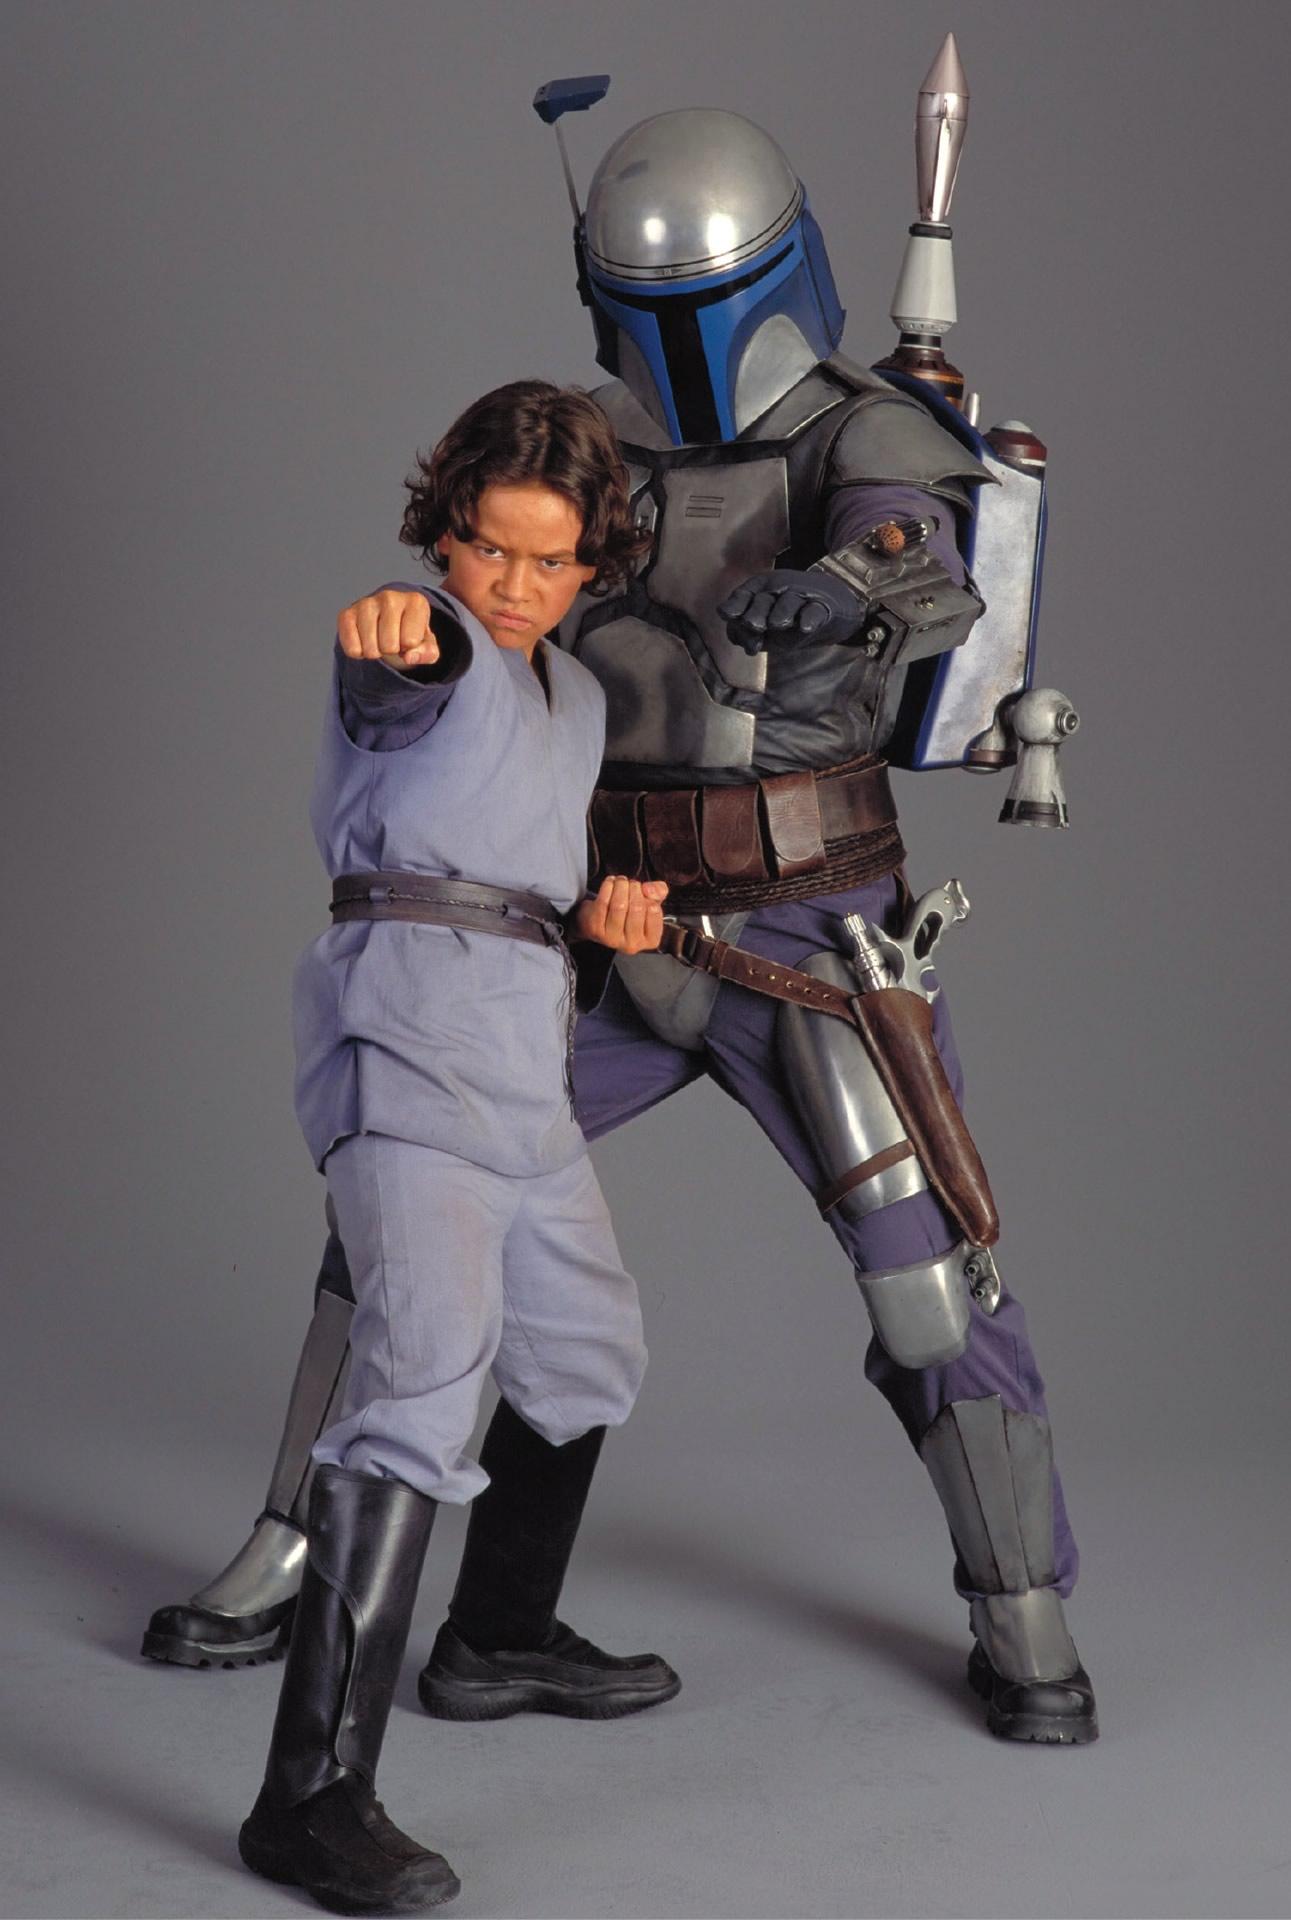 Temuera Morrison e Daniel Logan: Jango Fett e Boba Fett em Star Wars Ataque dos Clones, o Boba Fett, tem futuro incerto na franquia STAR WARS